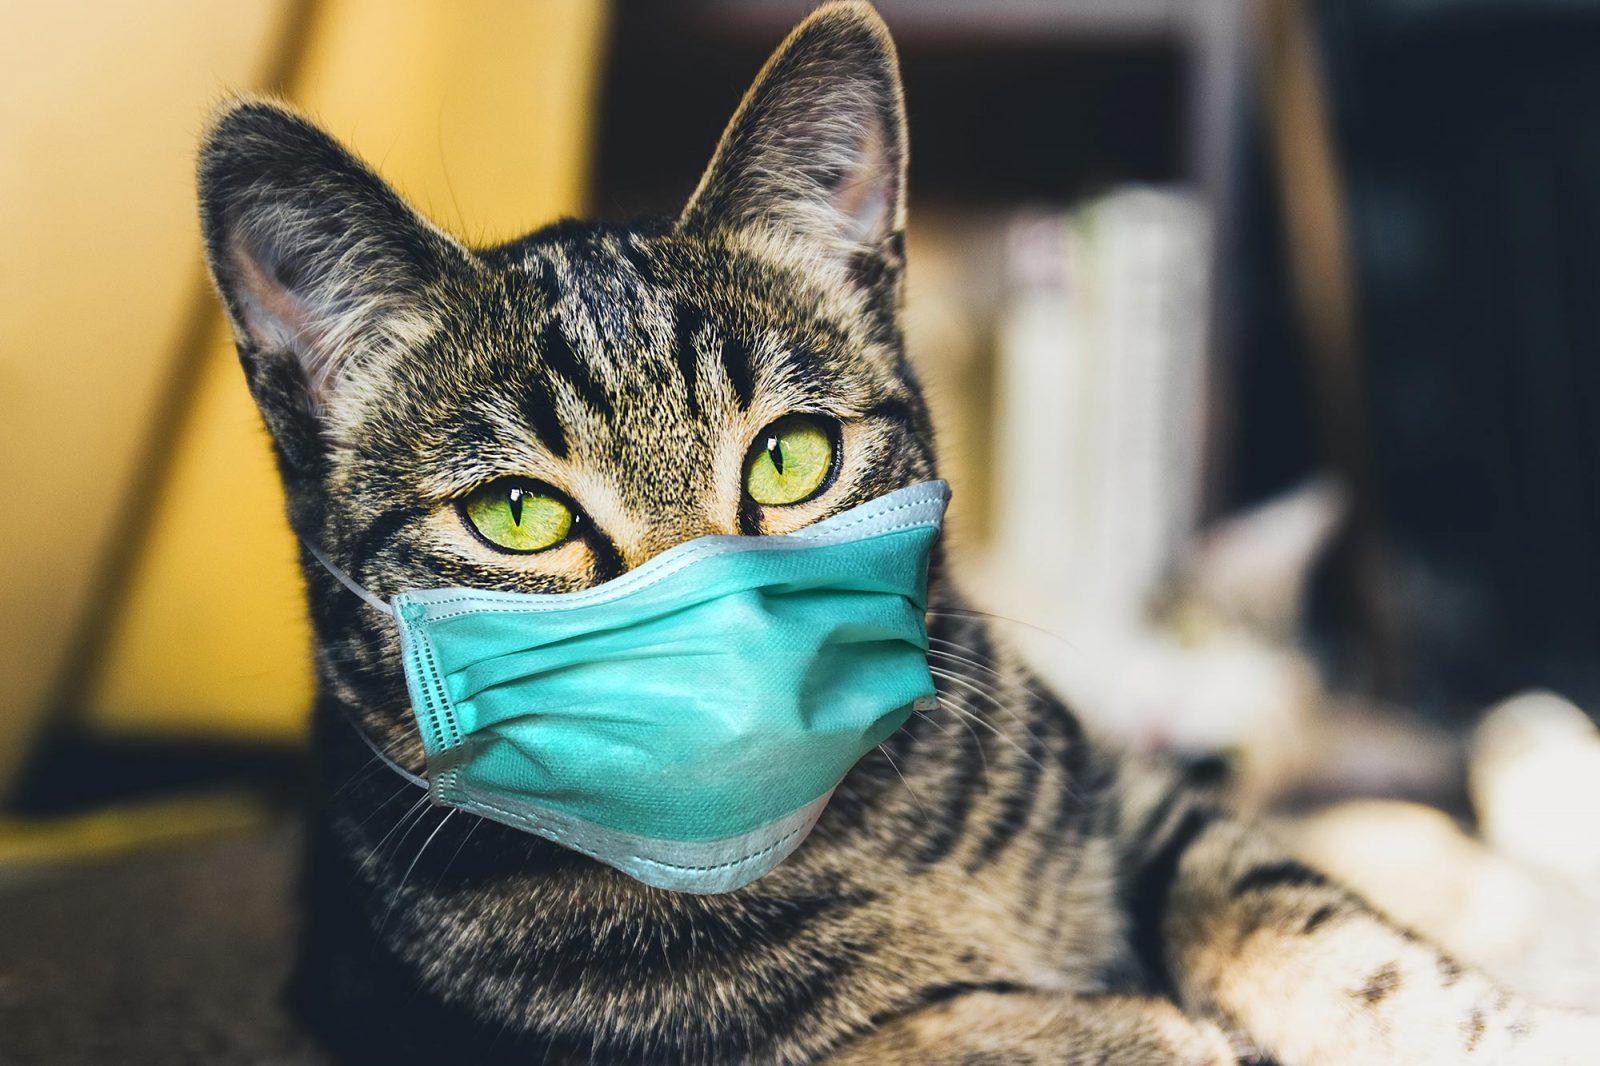 Gatos podem pegar COVID 19 / Coronavirus? 7